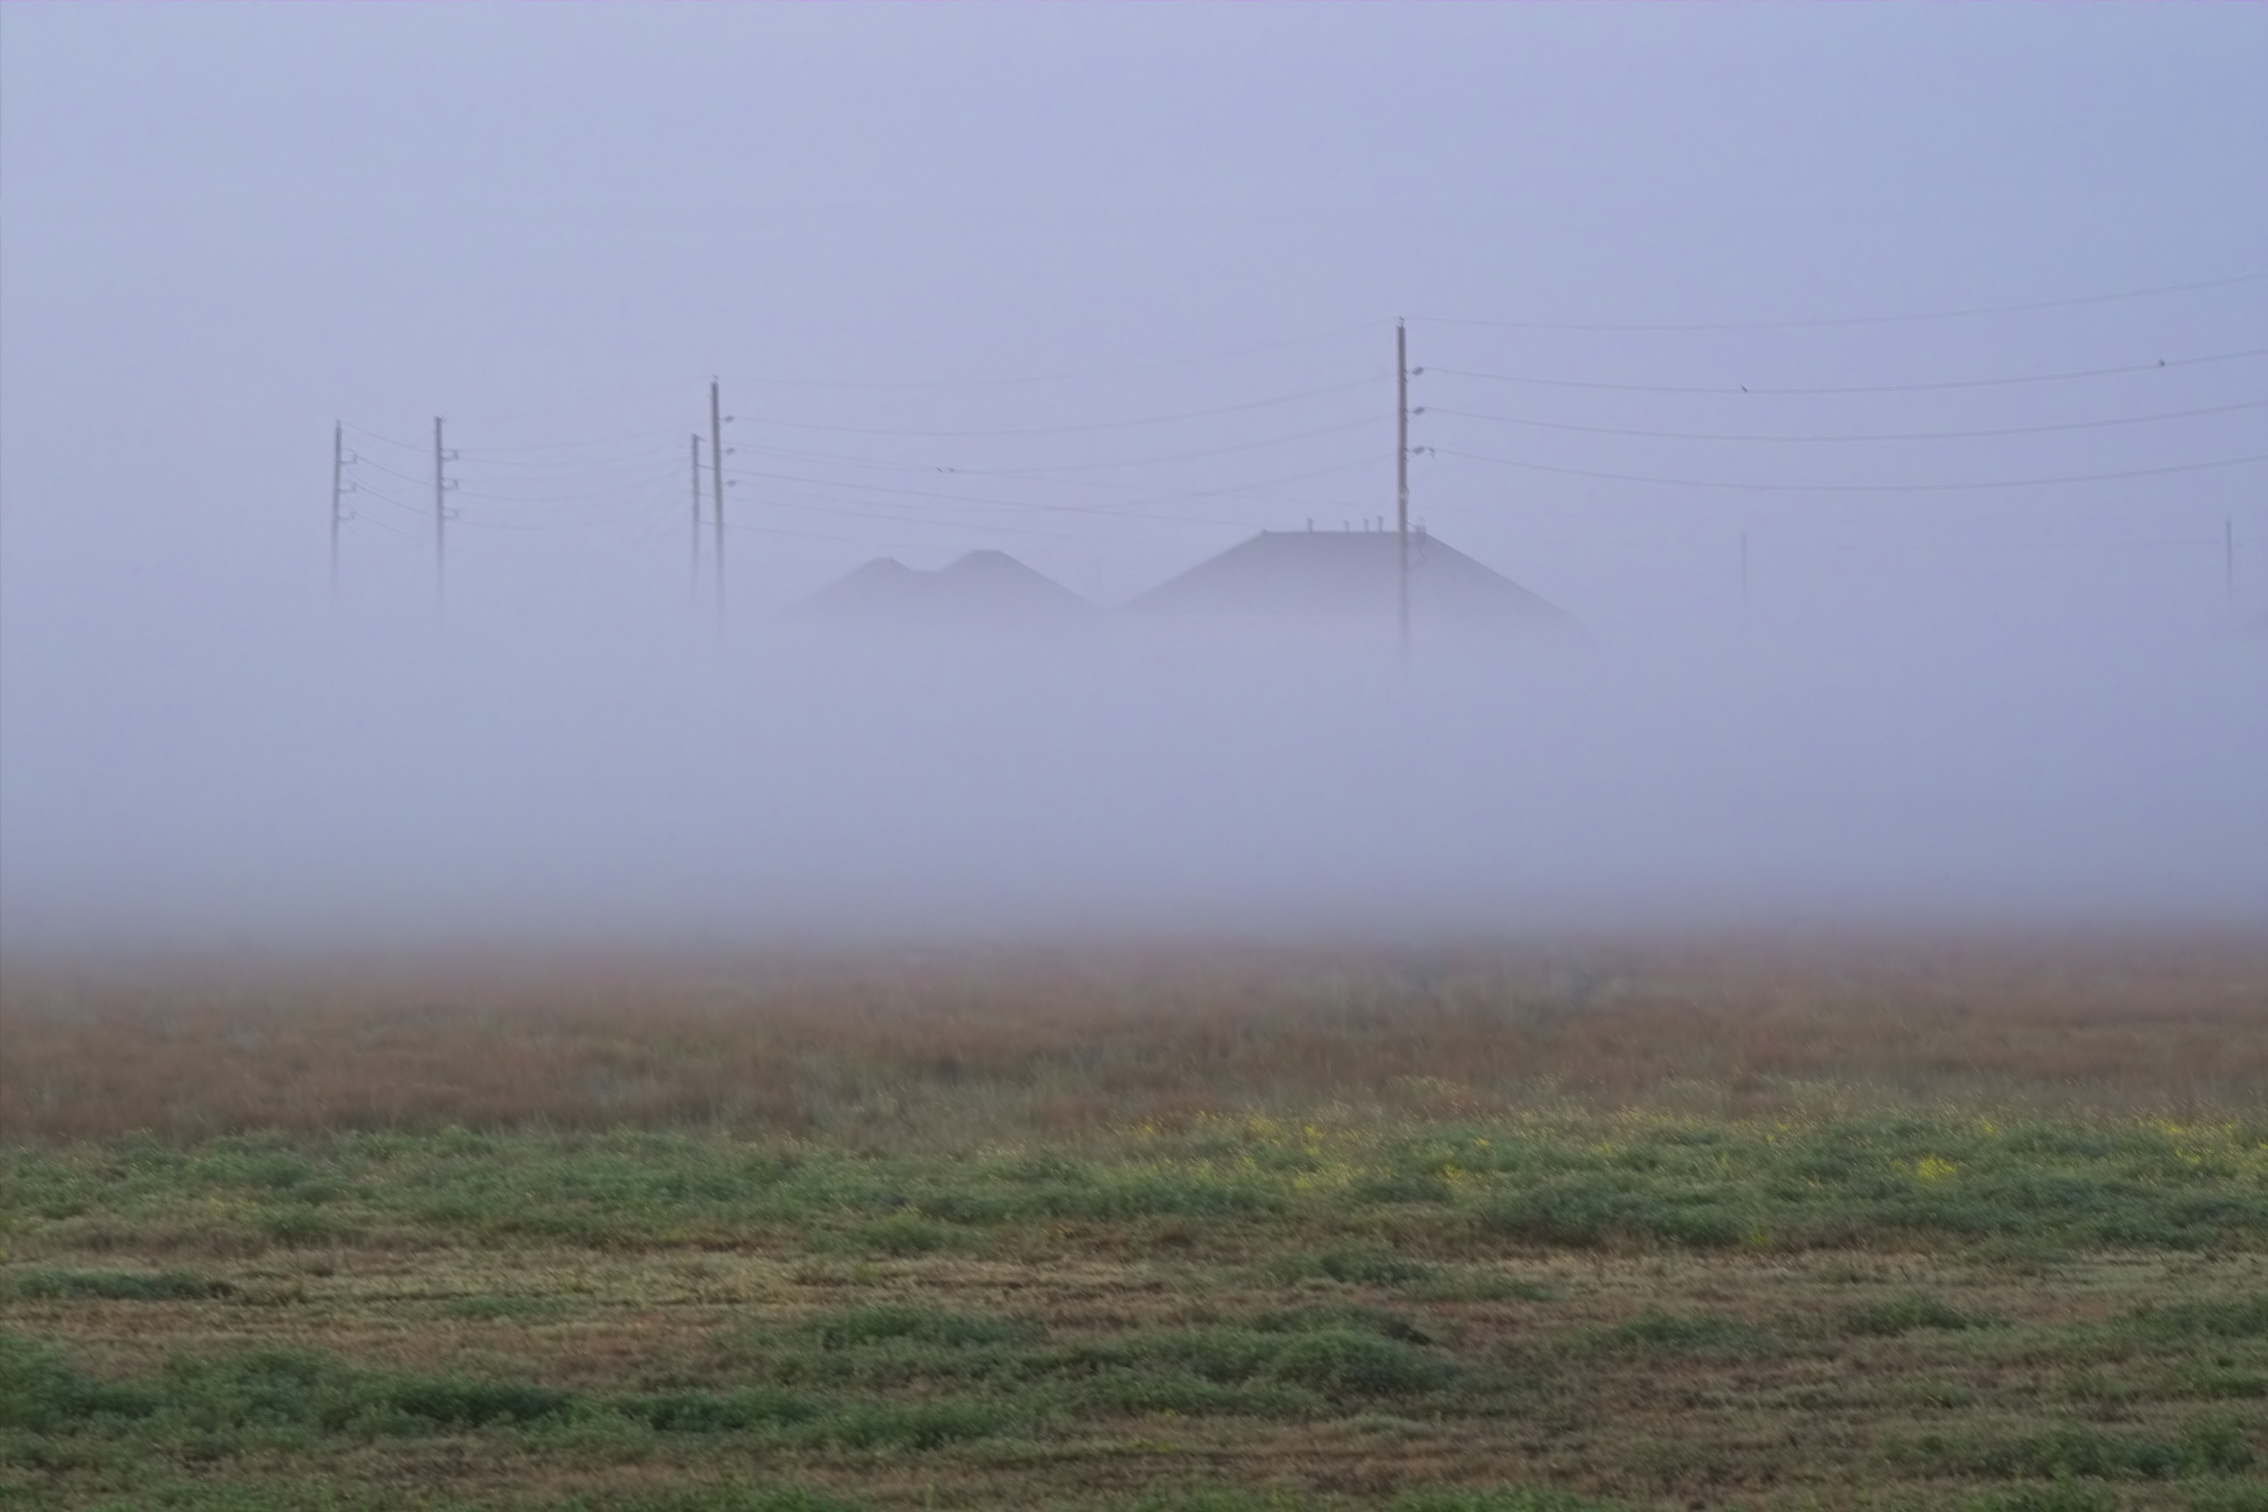 Fog Bank Rolling In